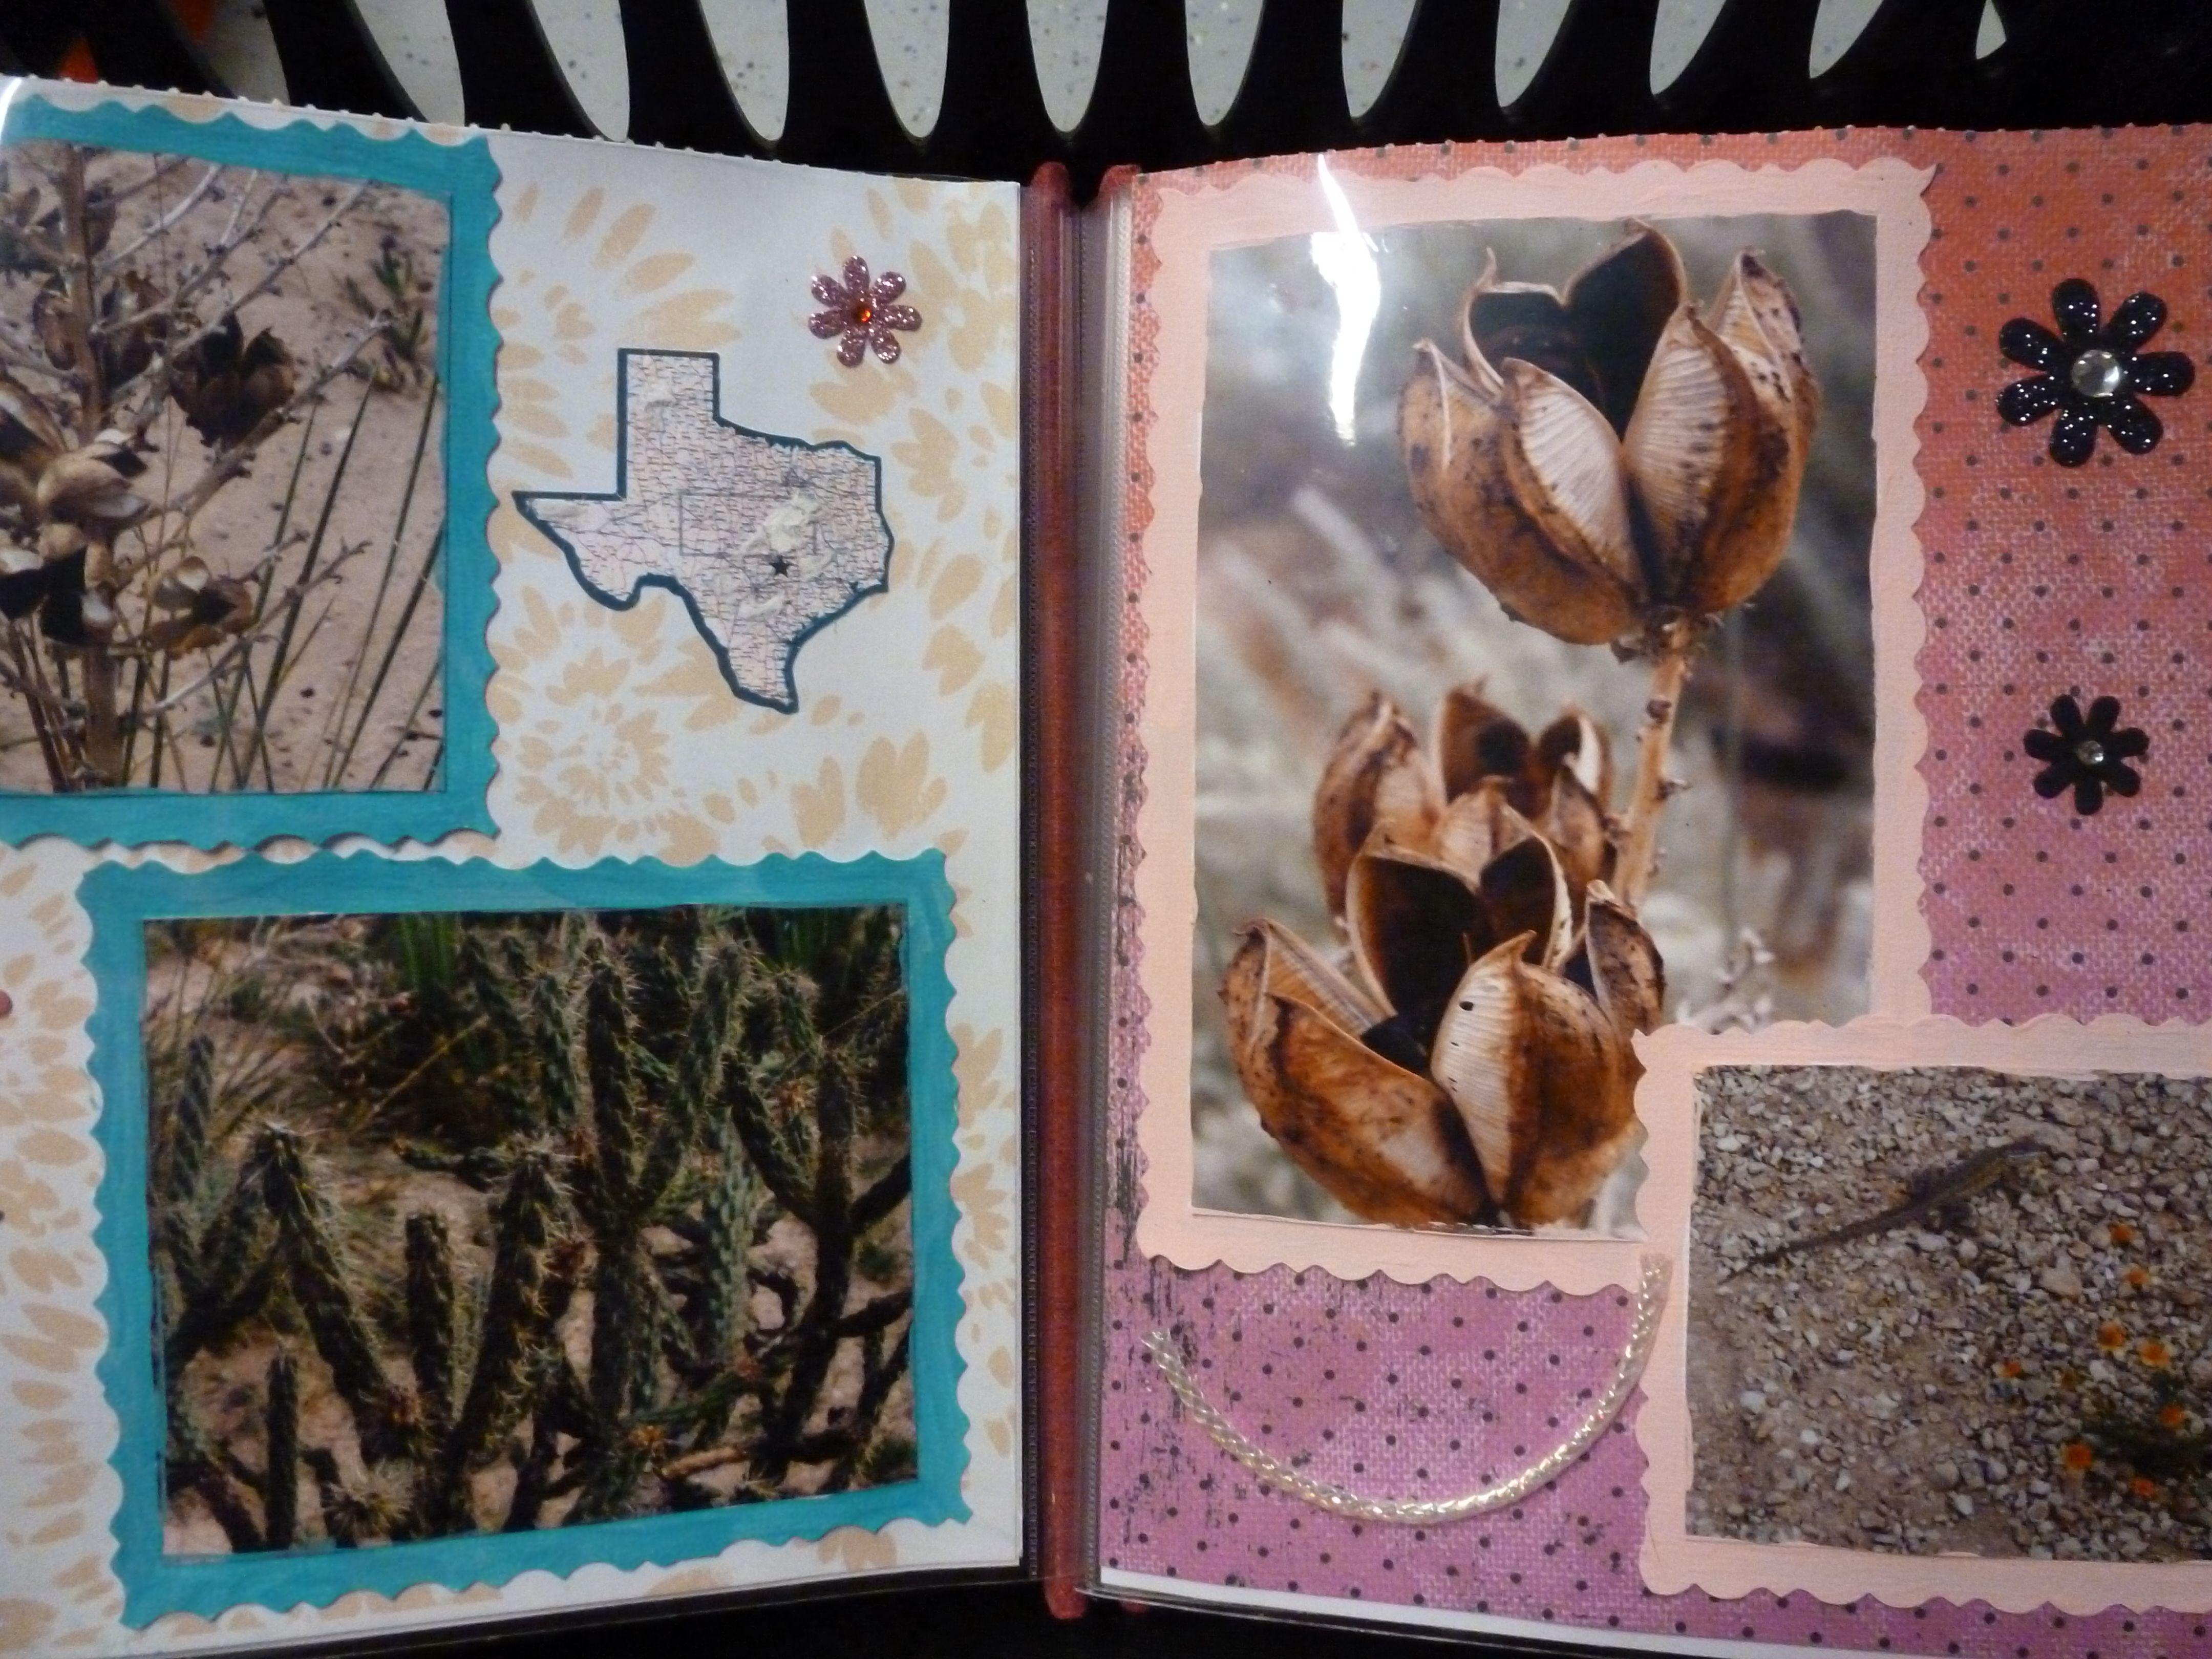 How to scrapbook 8x8 layouts - Monihans State Park West Texas Scrapbook Layout 8x8